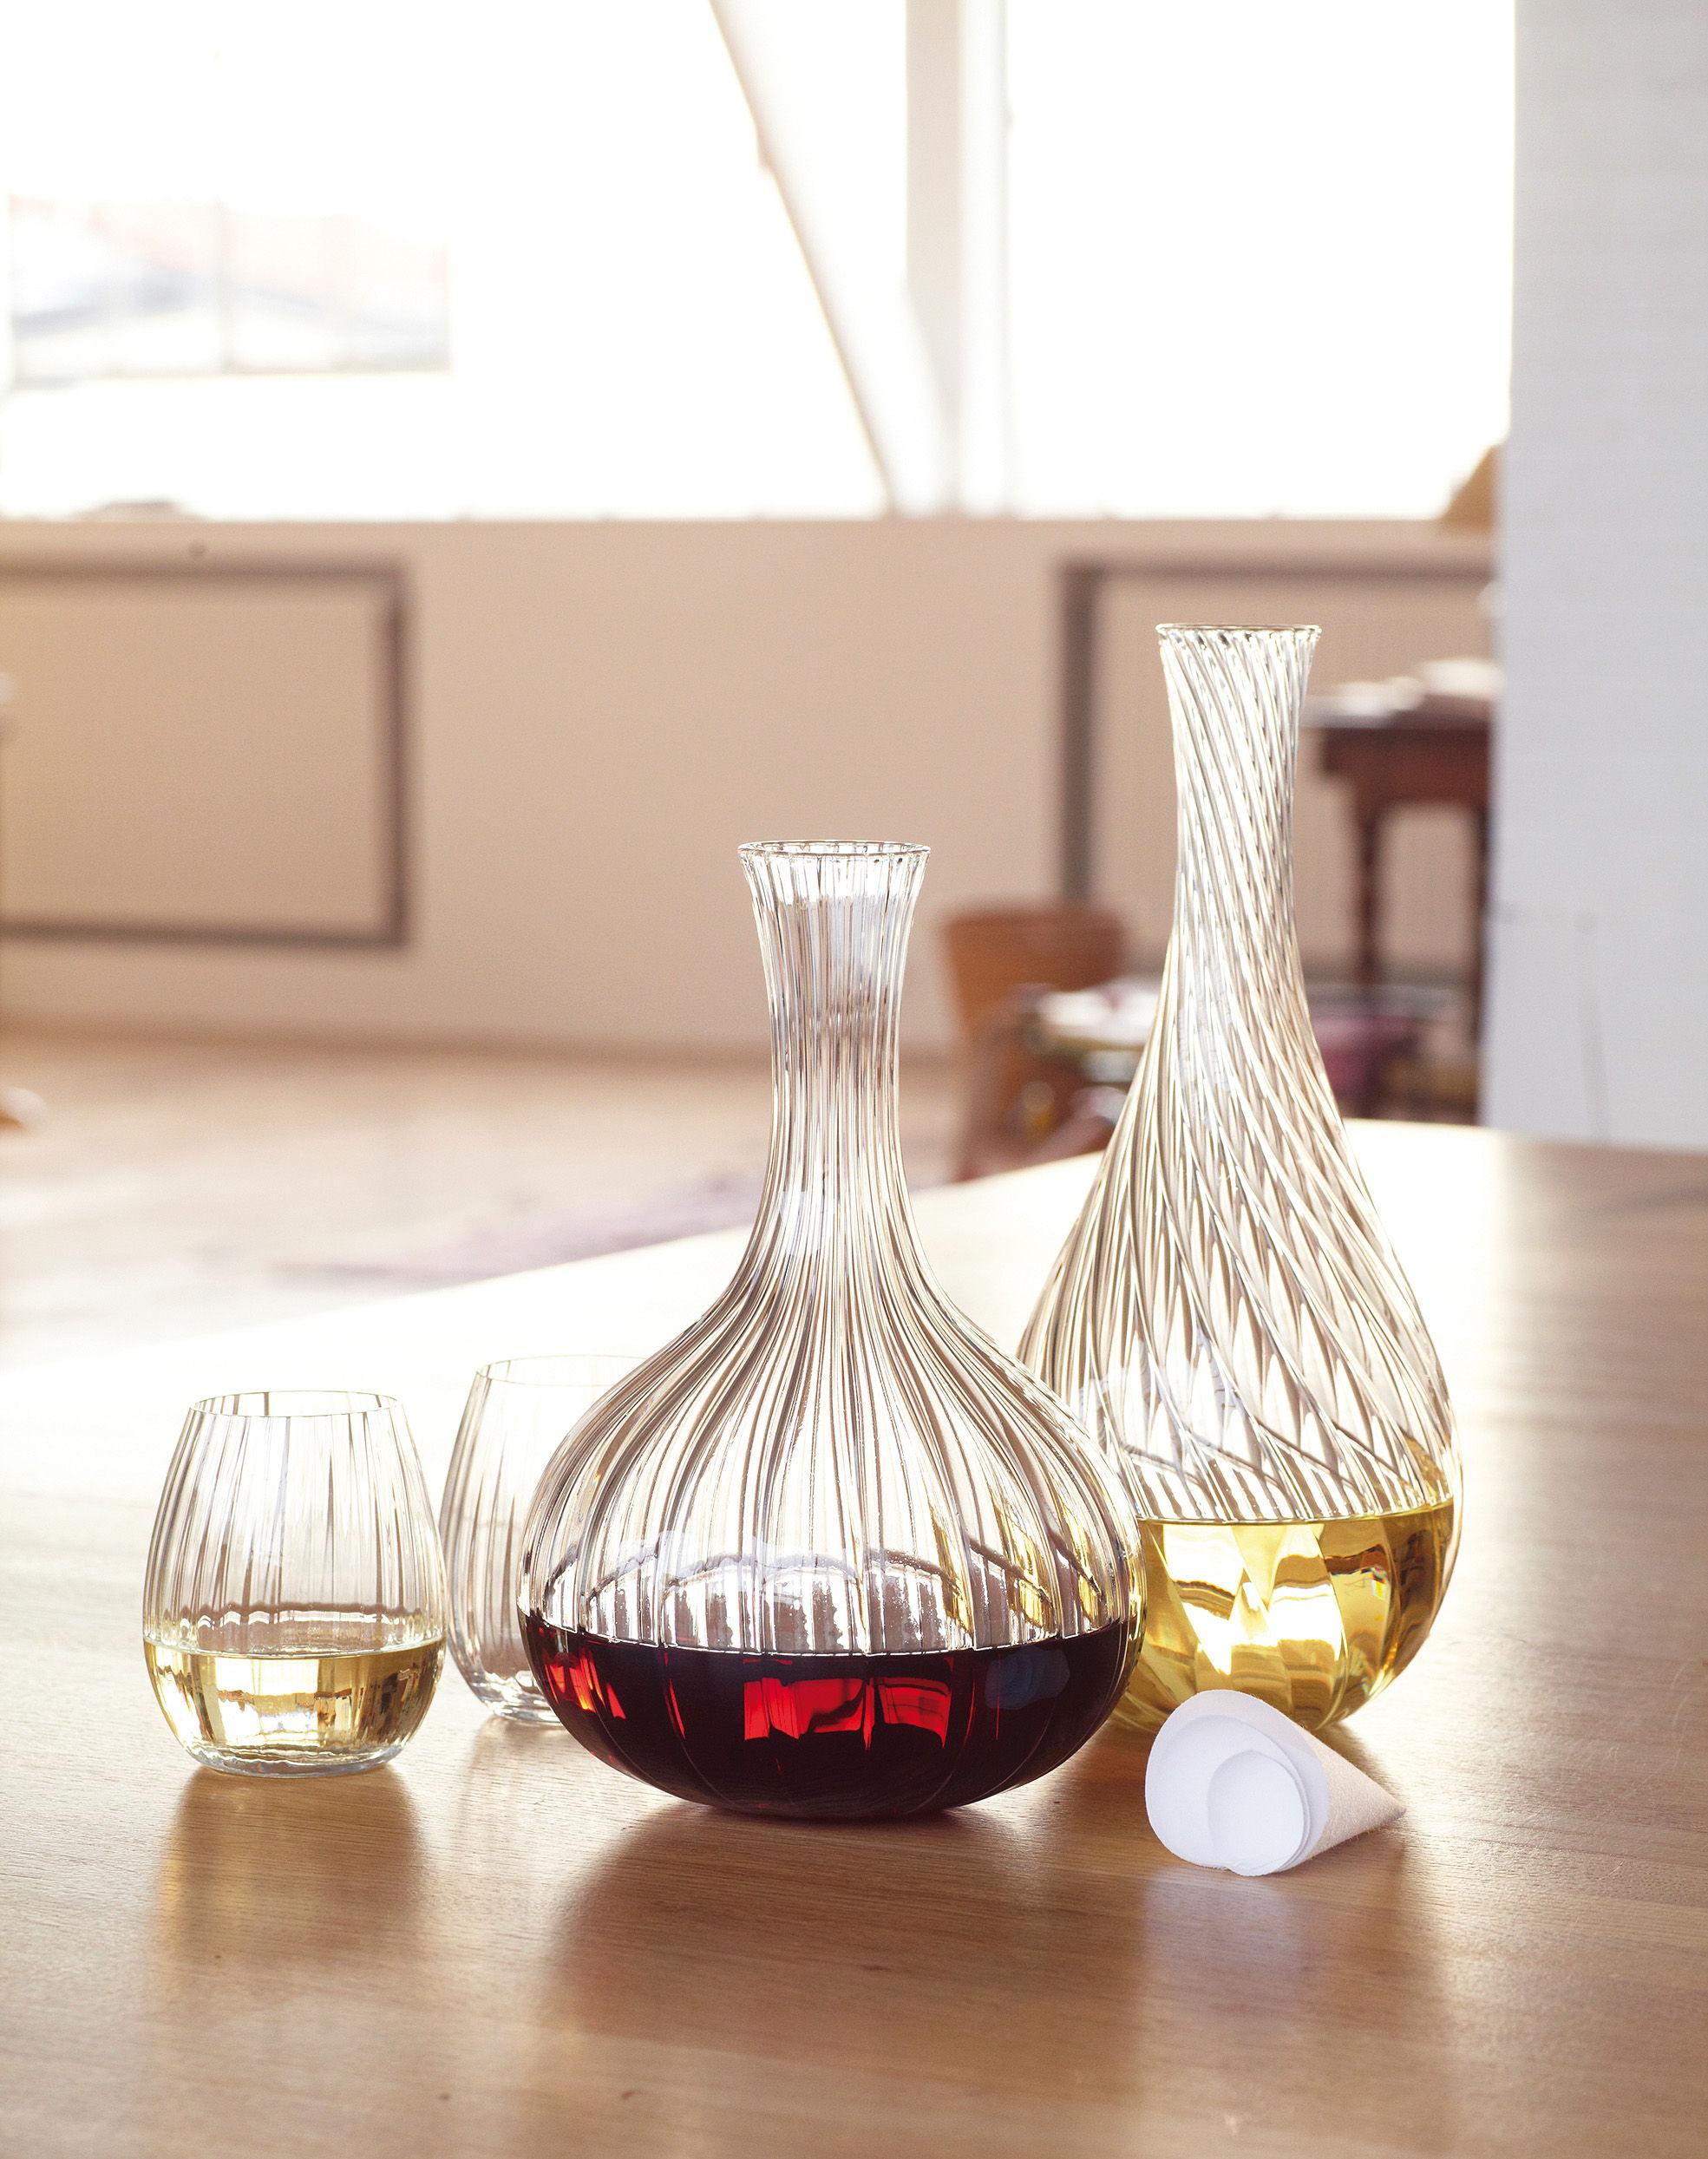 carafe ligne avec bouchon tissu 1 5 l transparent bouchon tissu blanc l 39 atelier du vin. Black Bedroom Furniture Sets. Home Design Ideas